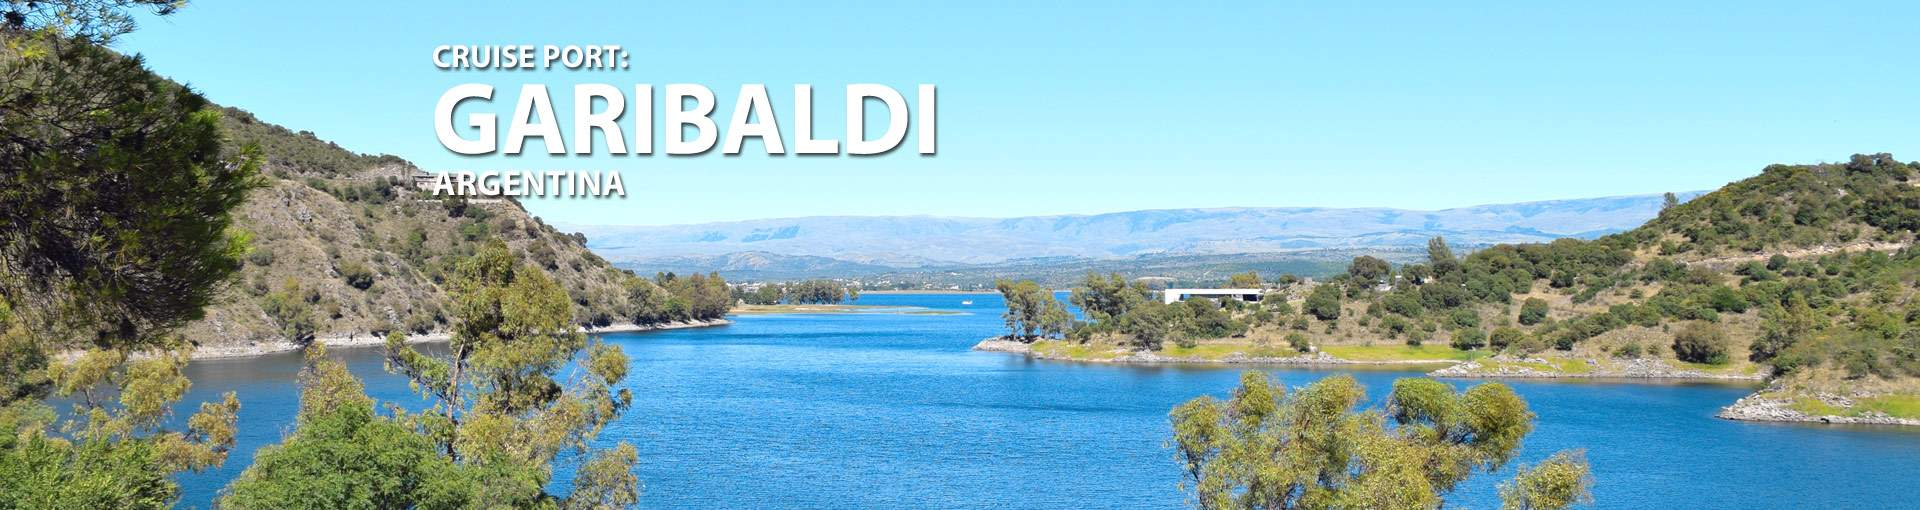 Garabaldi, Argentina Cruise Port